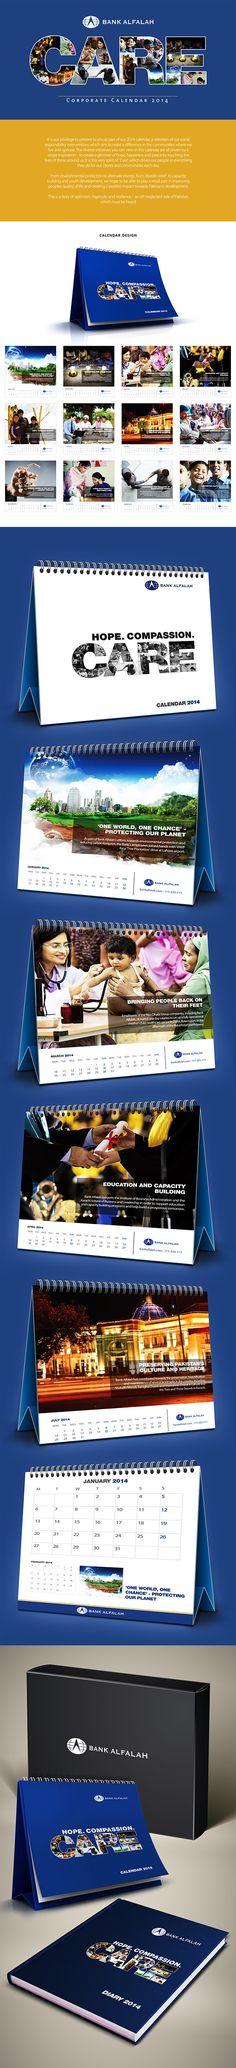 Alfalah Corporate Calendar 2014 on Behance